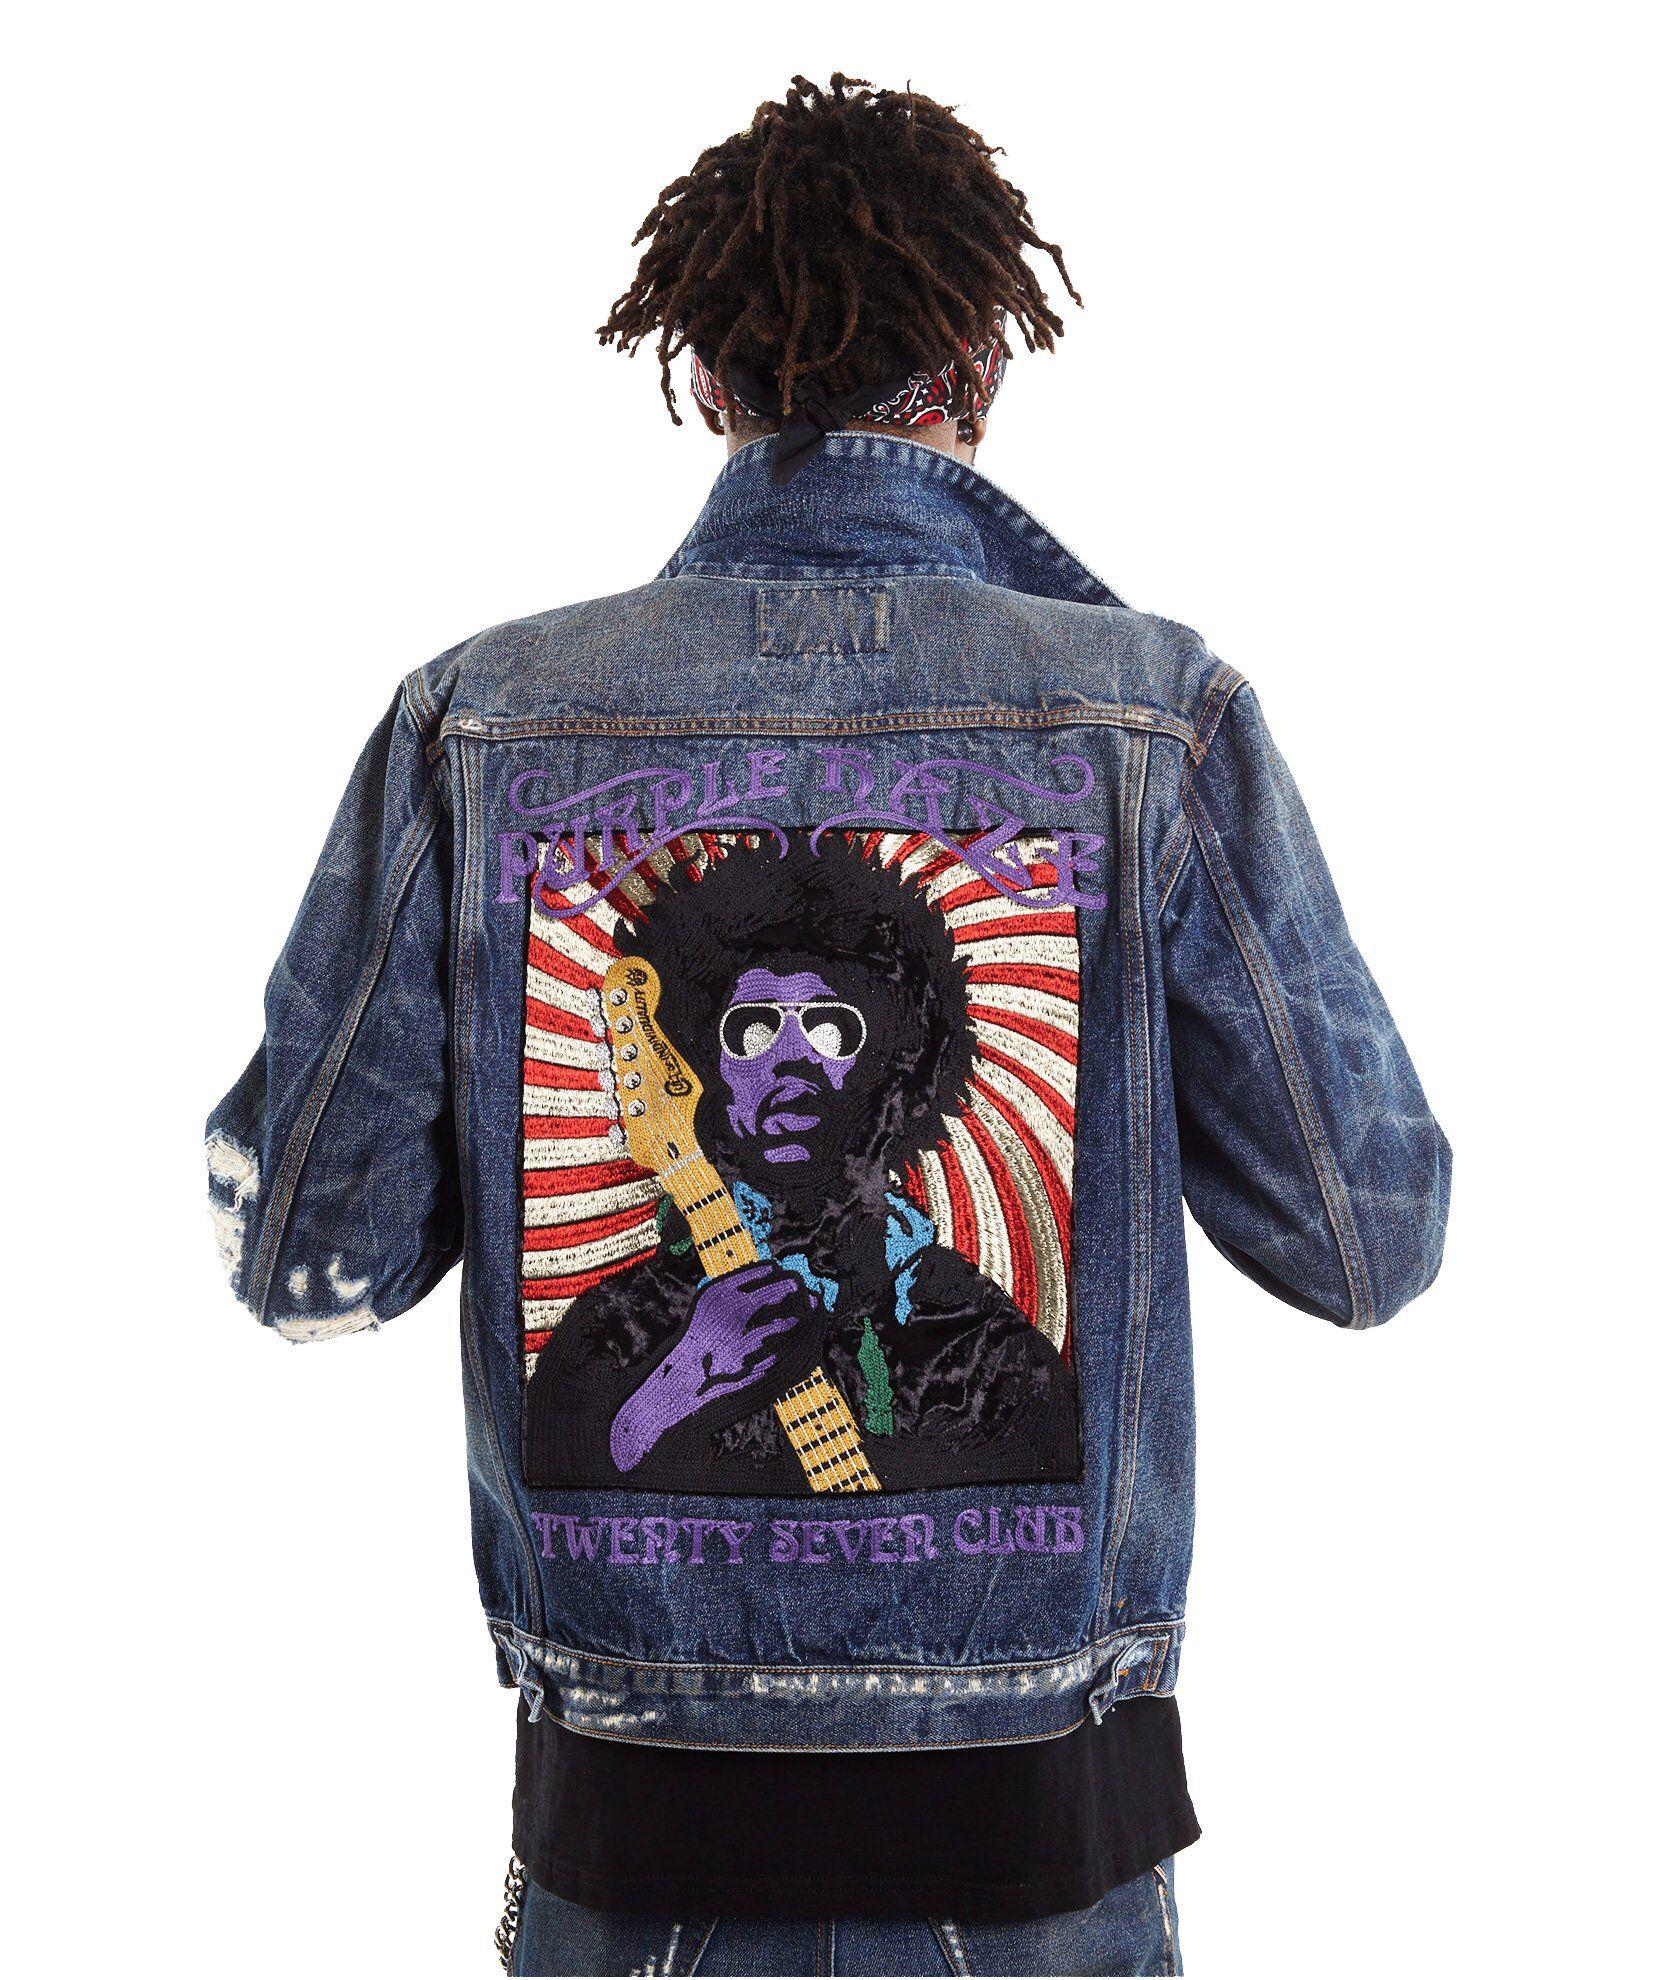 40b1faf0 Jimi Hendrix Purple Haze Men's Denim Jacket - Cult of Individuality ...